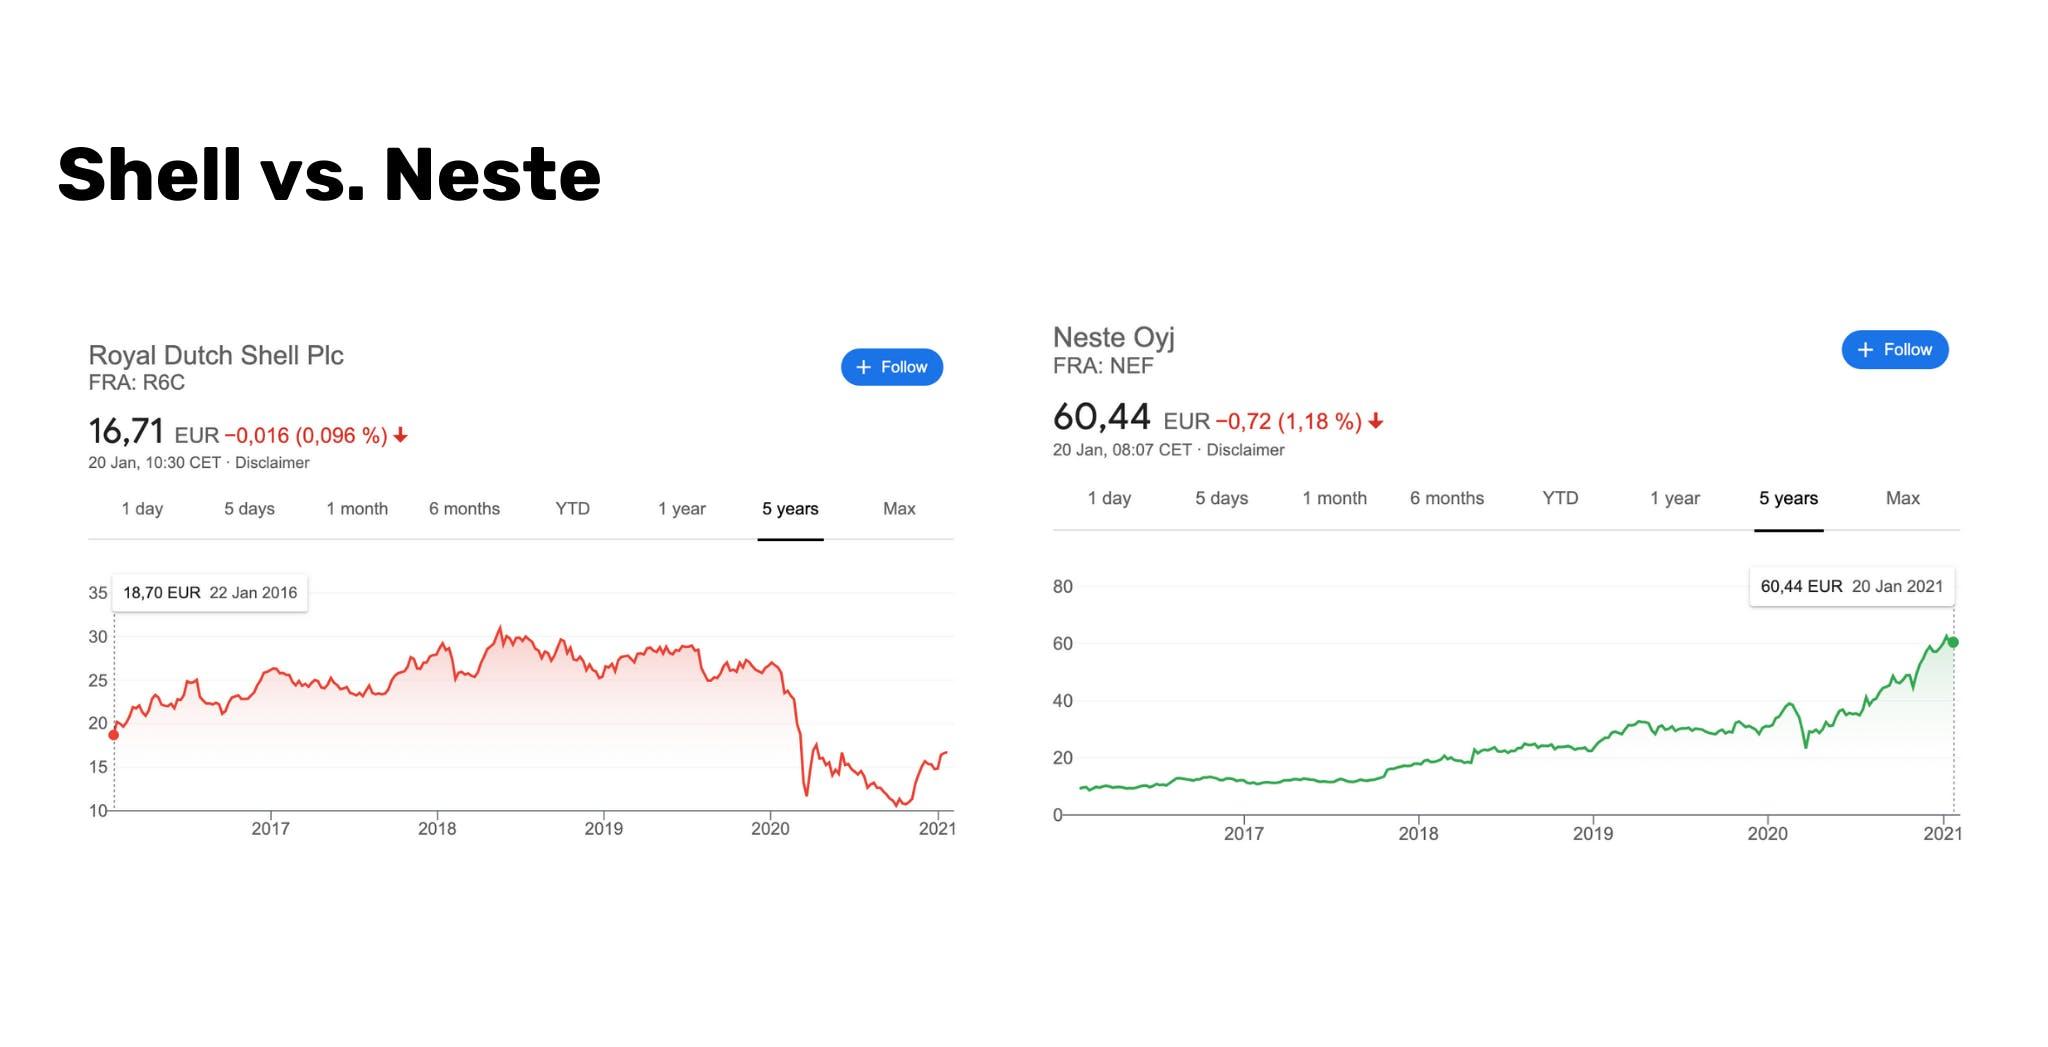 Sustainable stock vs. unsustainable stock